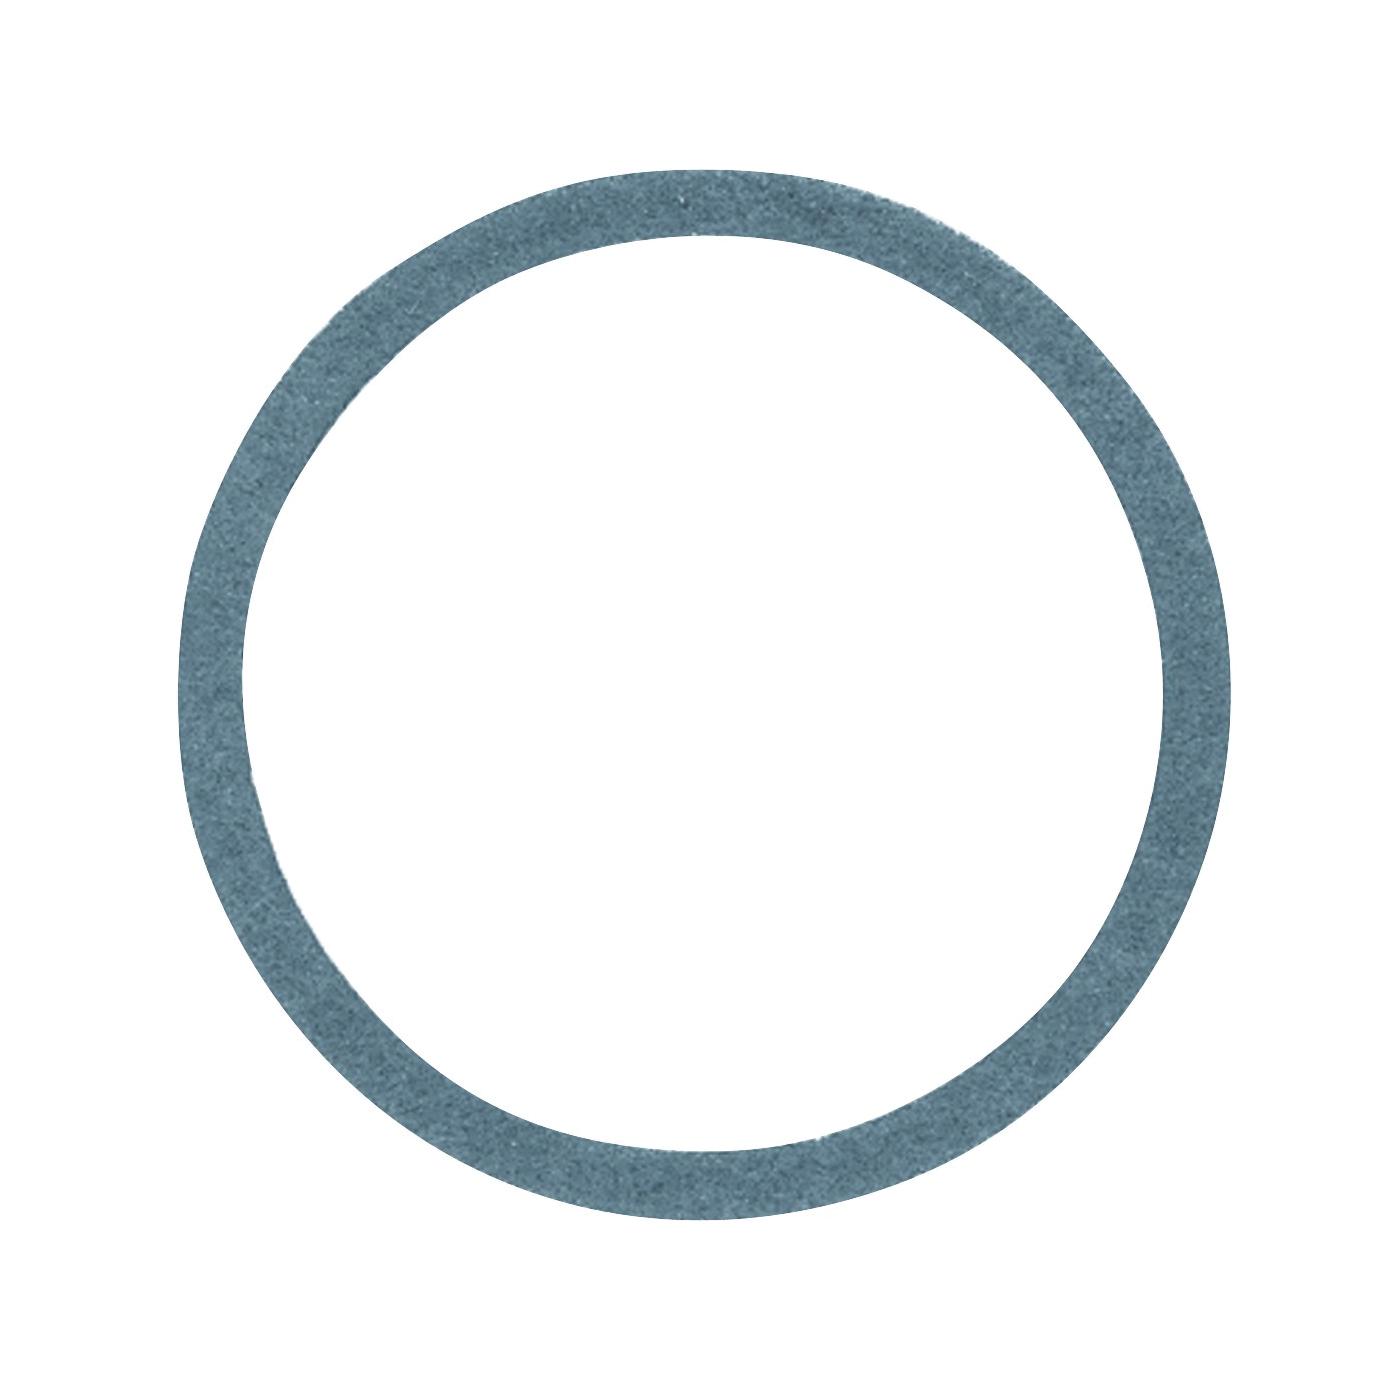 Picture of Danco 35568B Cap Thread Gasket, #33, 1-1/16 in ID x 1-1/4 in OD Dia, 5/64 in Thick, Fiber